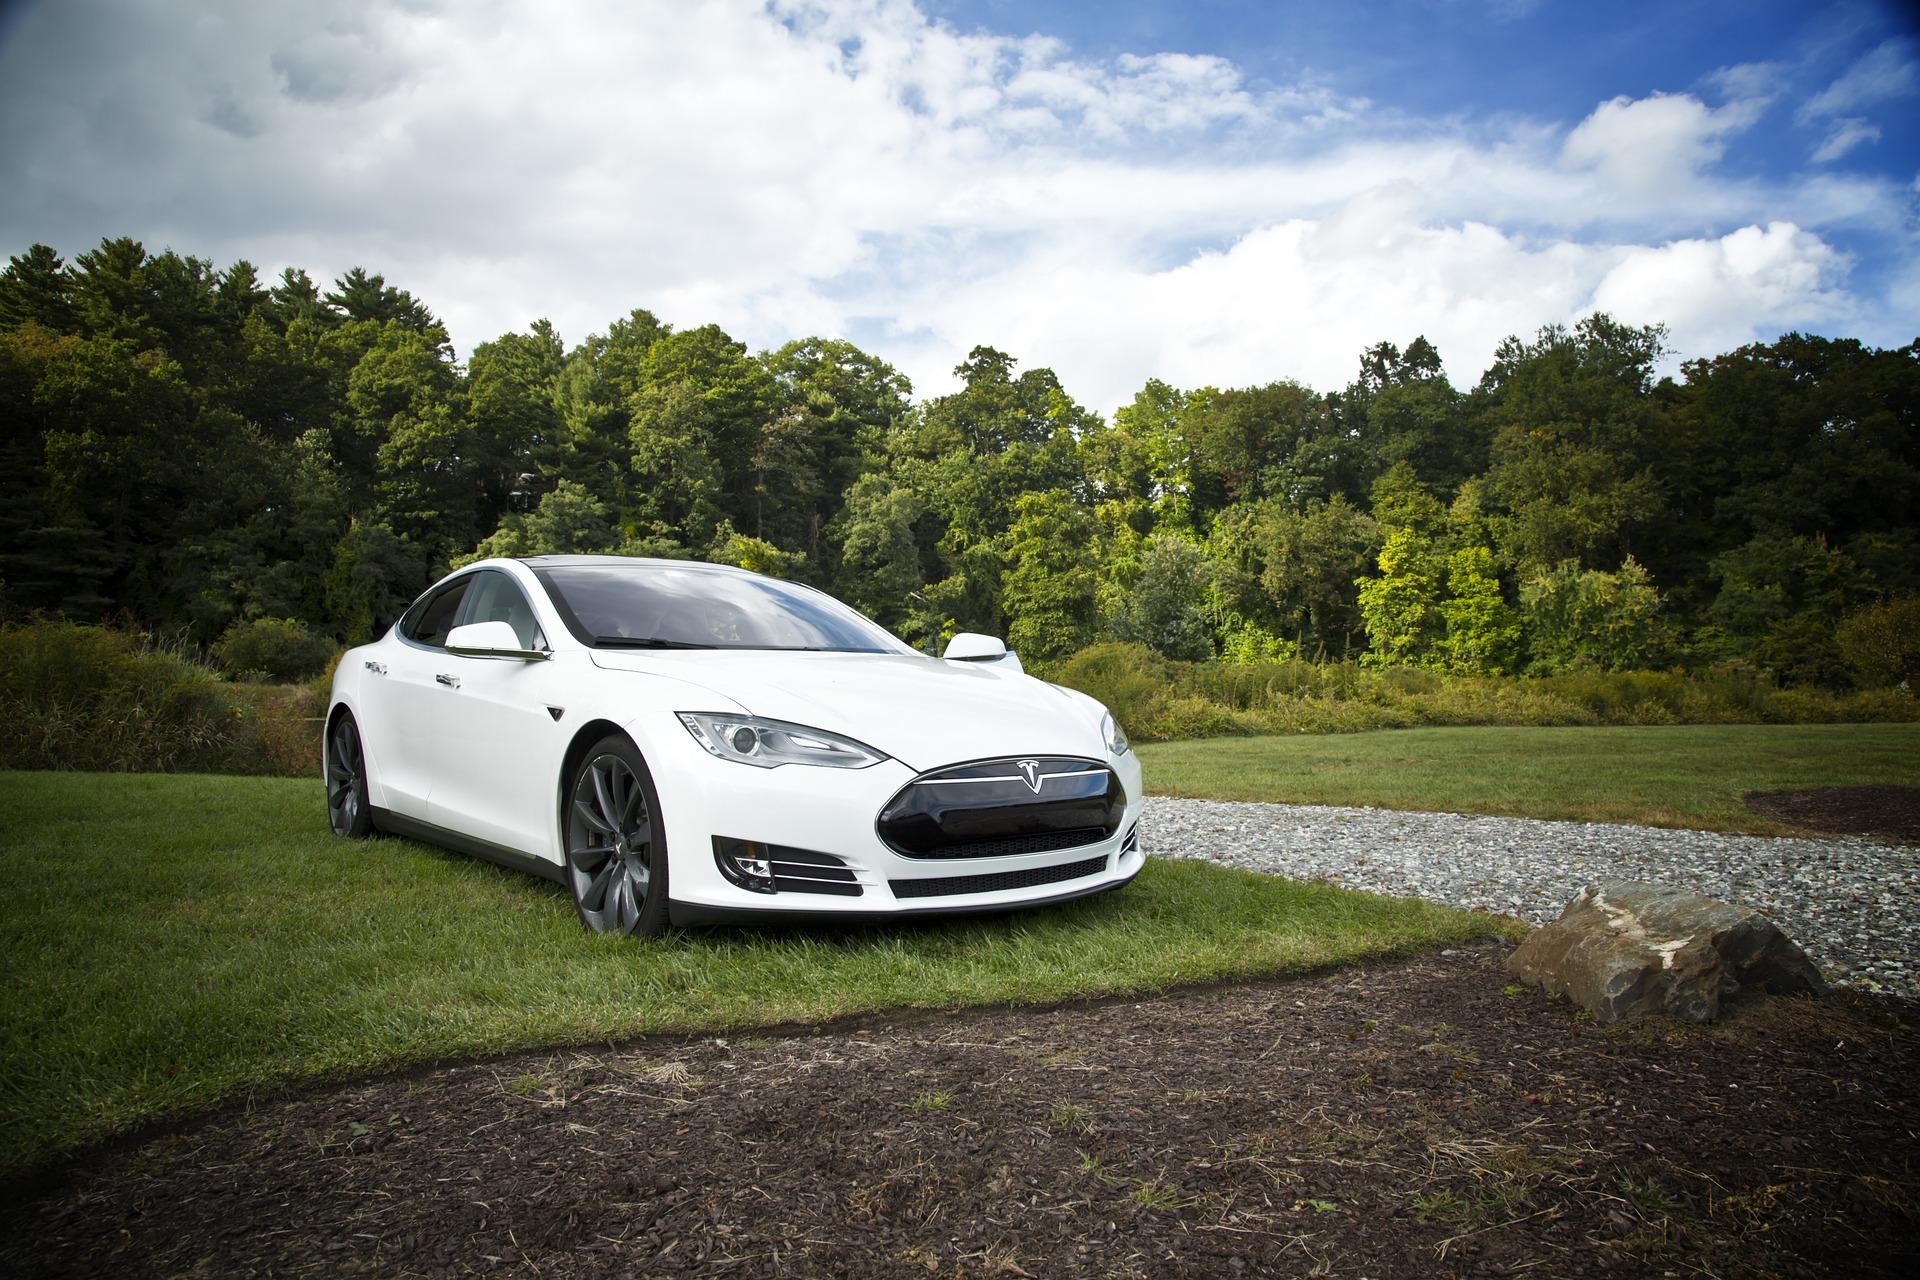 Autonomous Vehicle Market Report: Size, Forecast, and Research